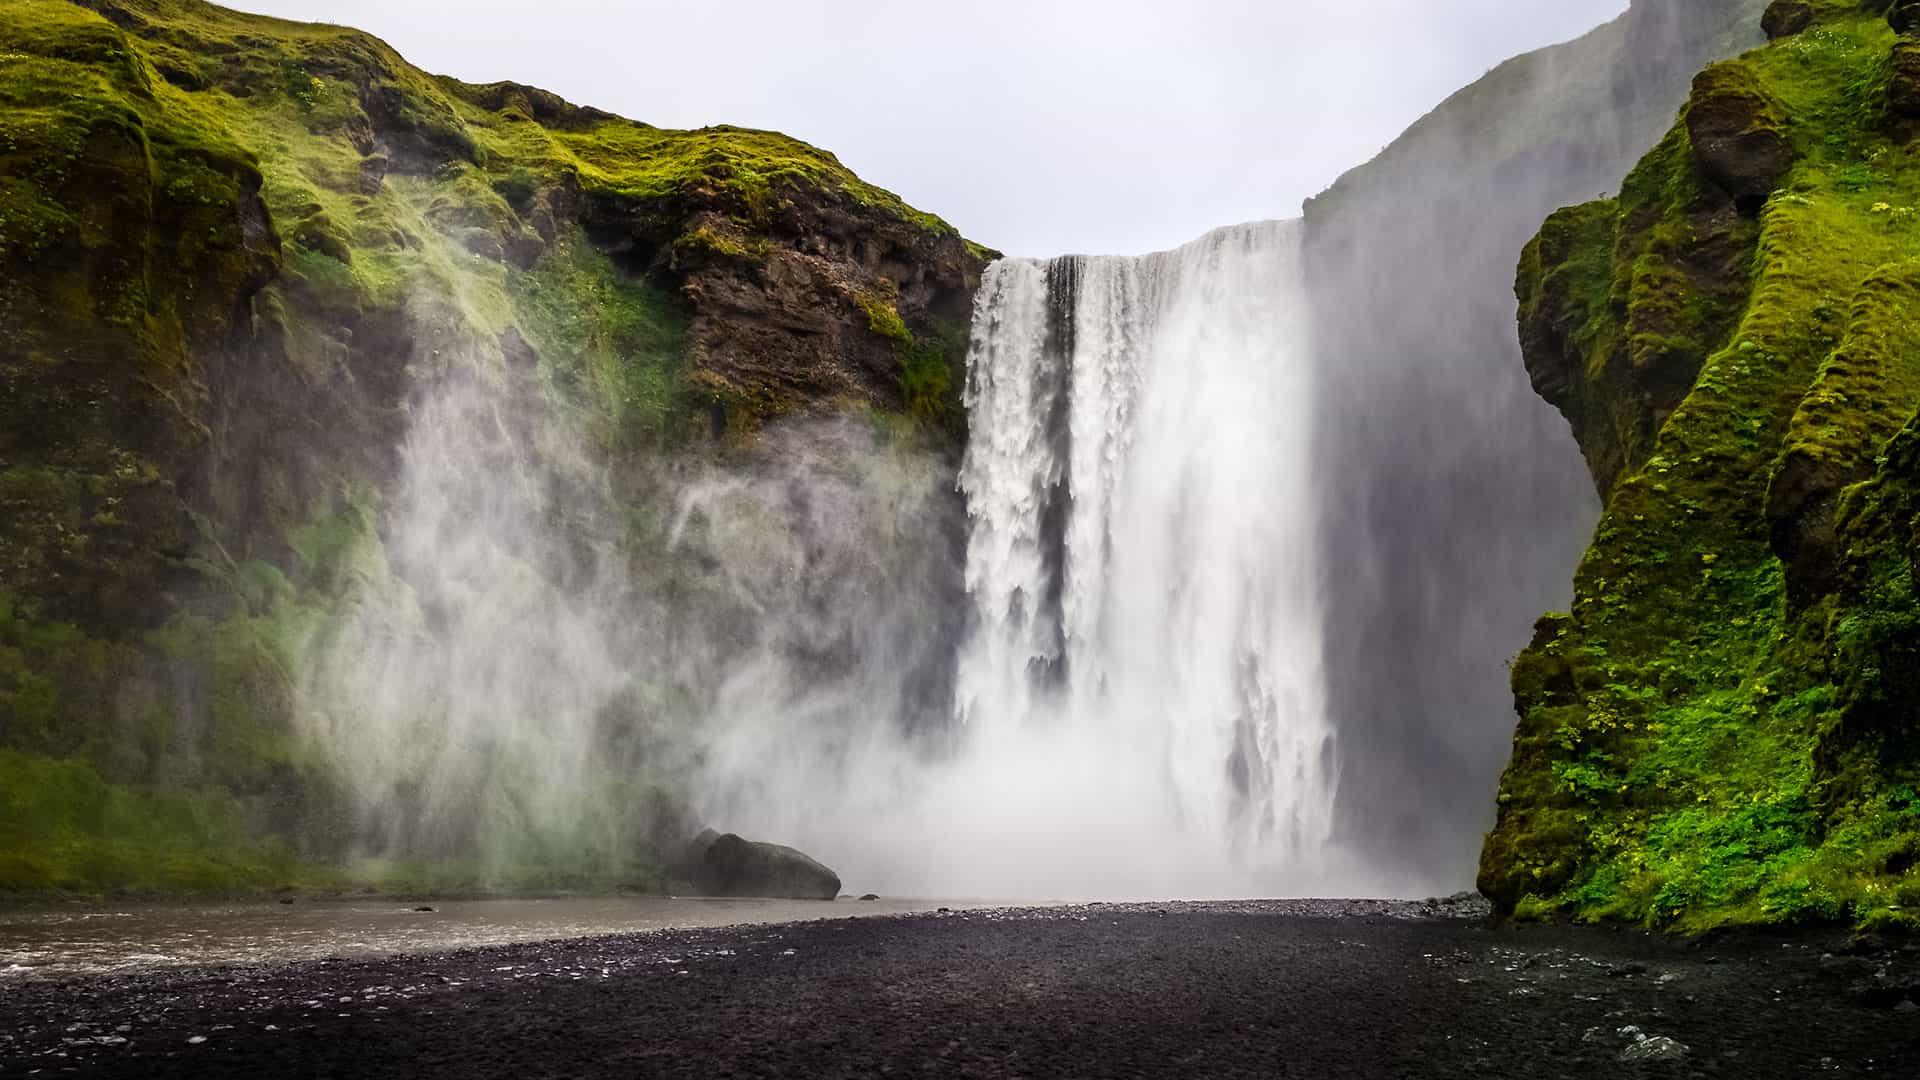 Amazing Falls Wallpaper Golden Circle And South Coast 4 Days 3 Nights Nordic